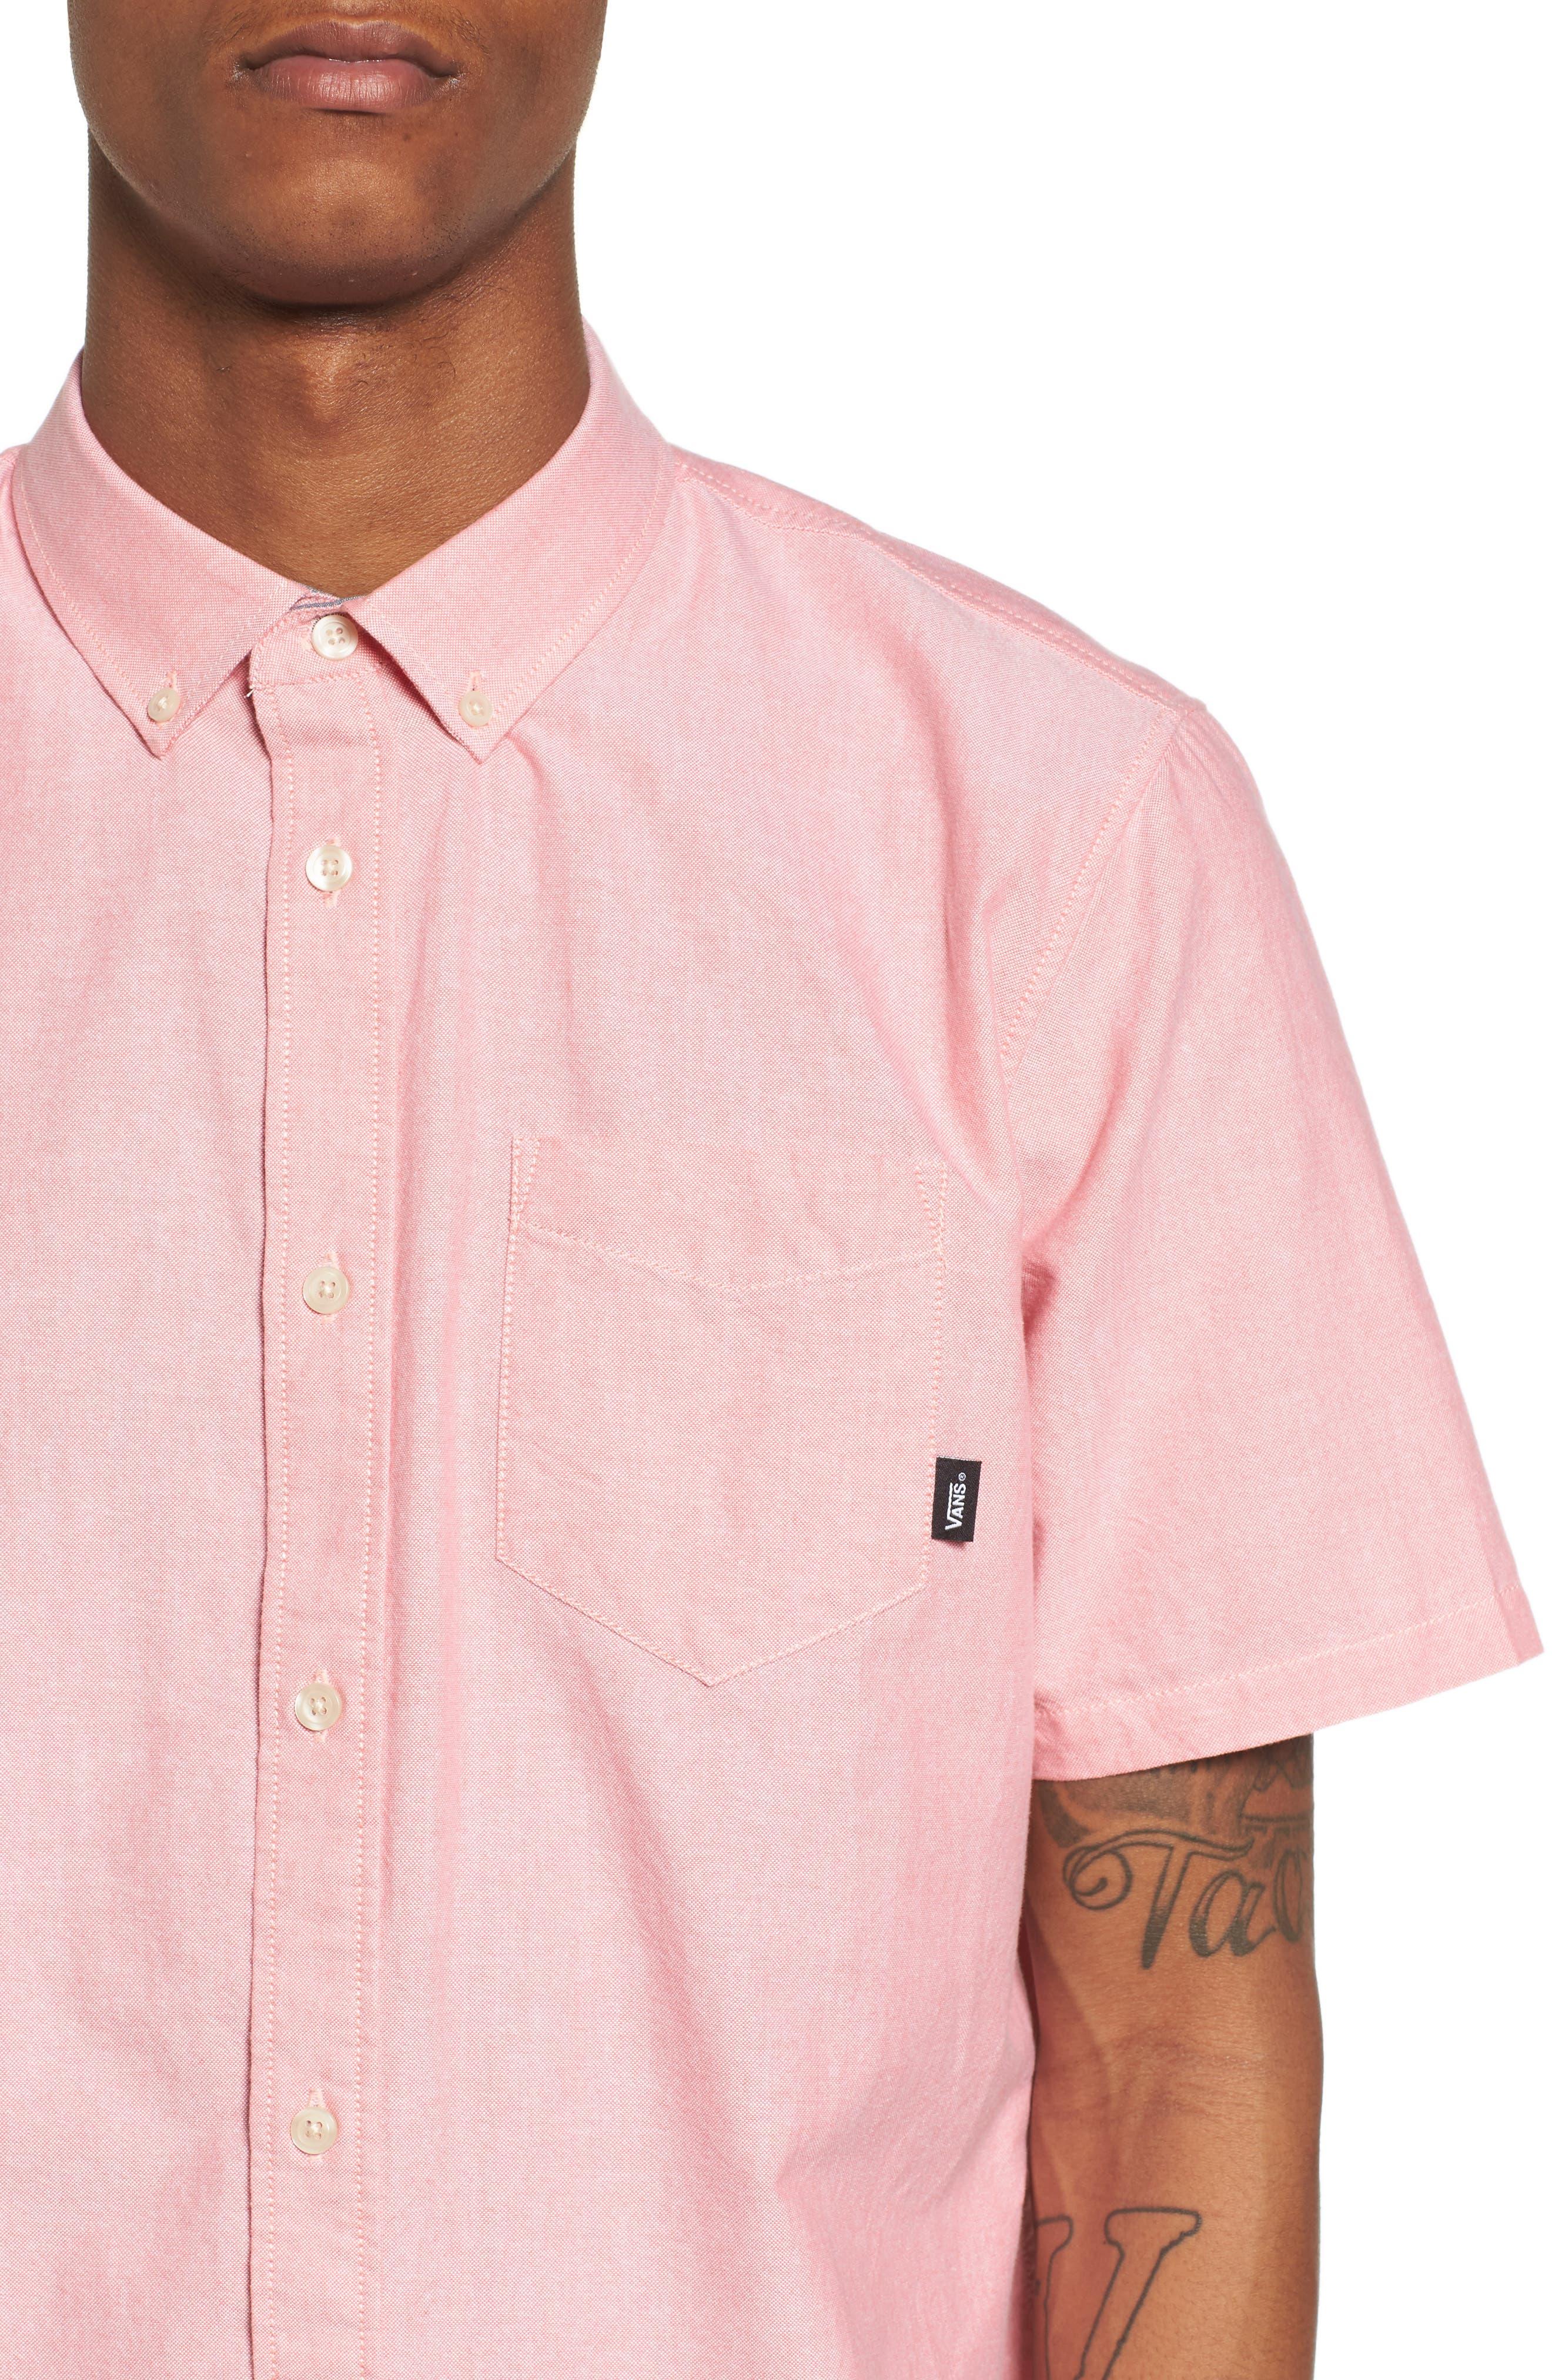 Houser Solid Woven Shirt,                             Alternate thumbnail 4, color,